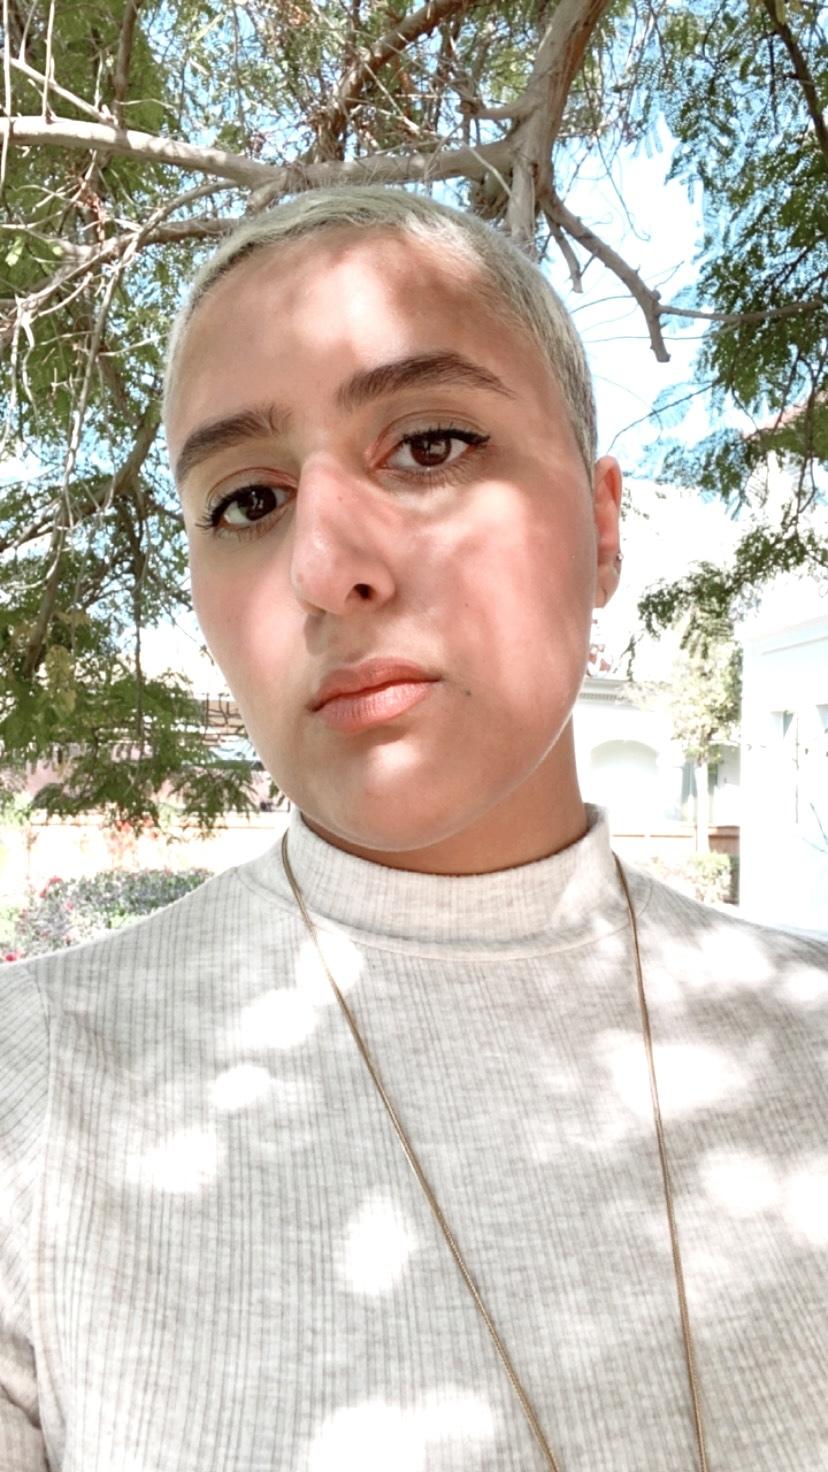 26-year-old, Single From: Dubai, Dubai, The Middle East